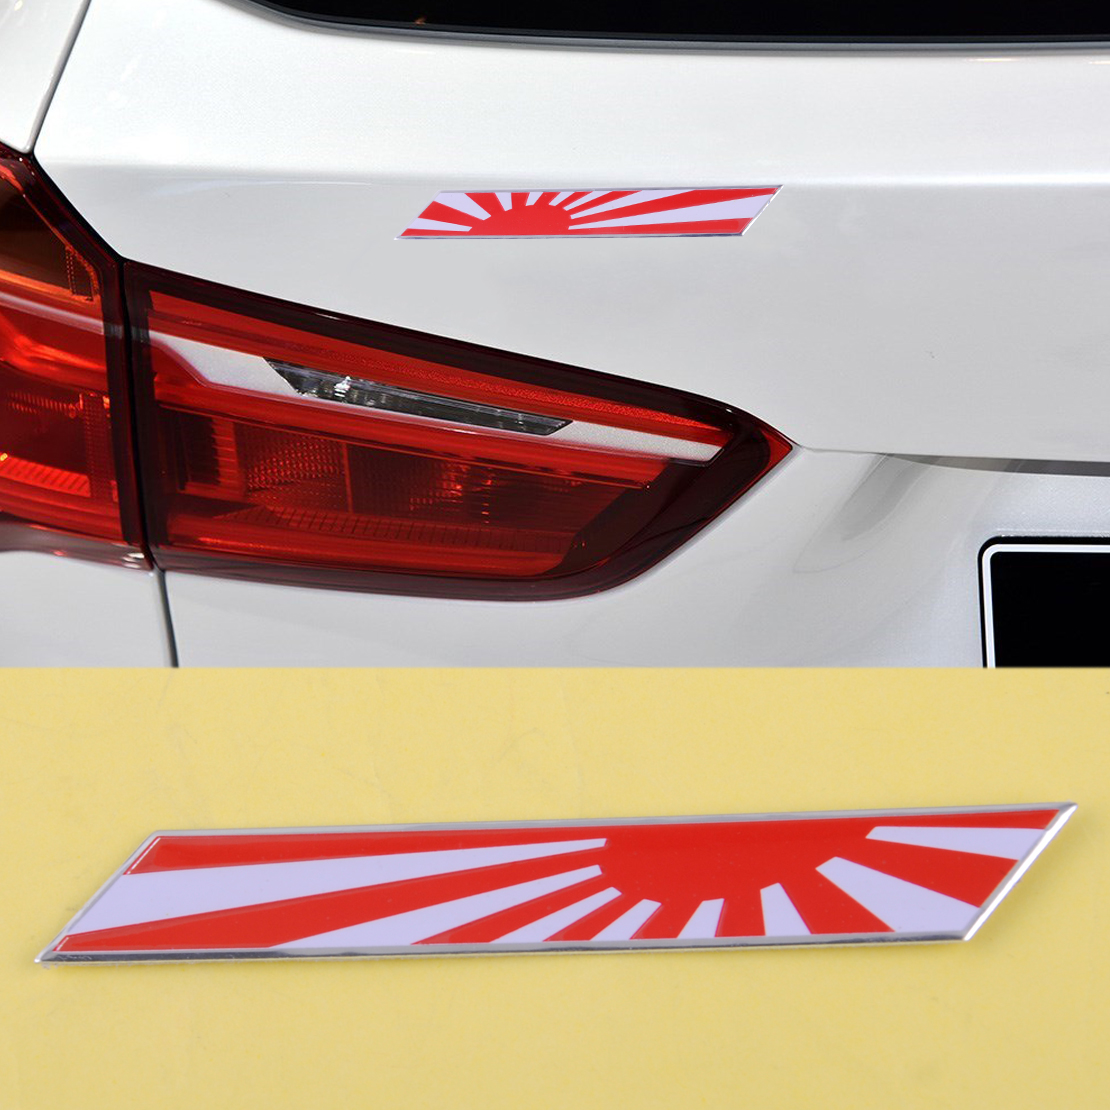 Aliexpress.com : Buy DWCX Car ABS JDM Japan Rising Sun ...